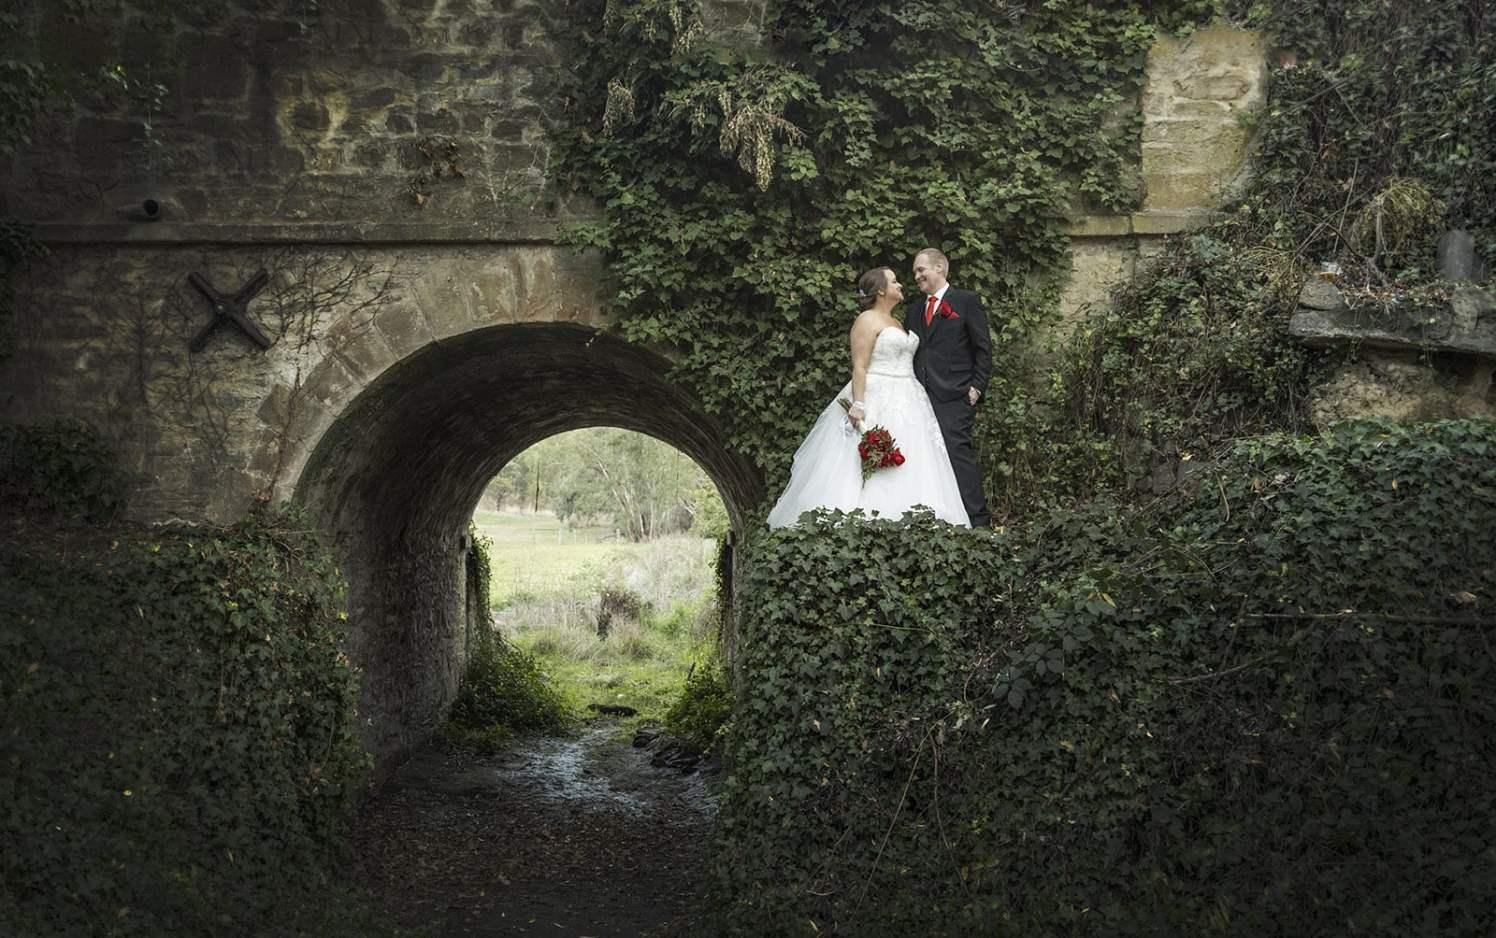 Gallop bridge Wedding photo